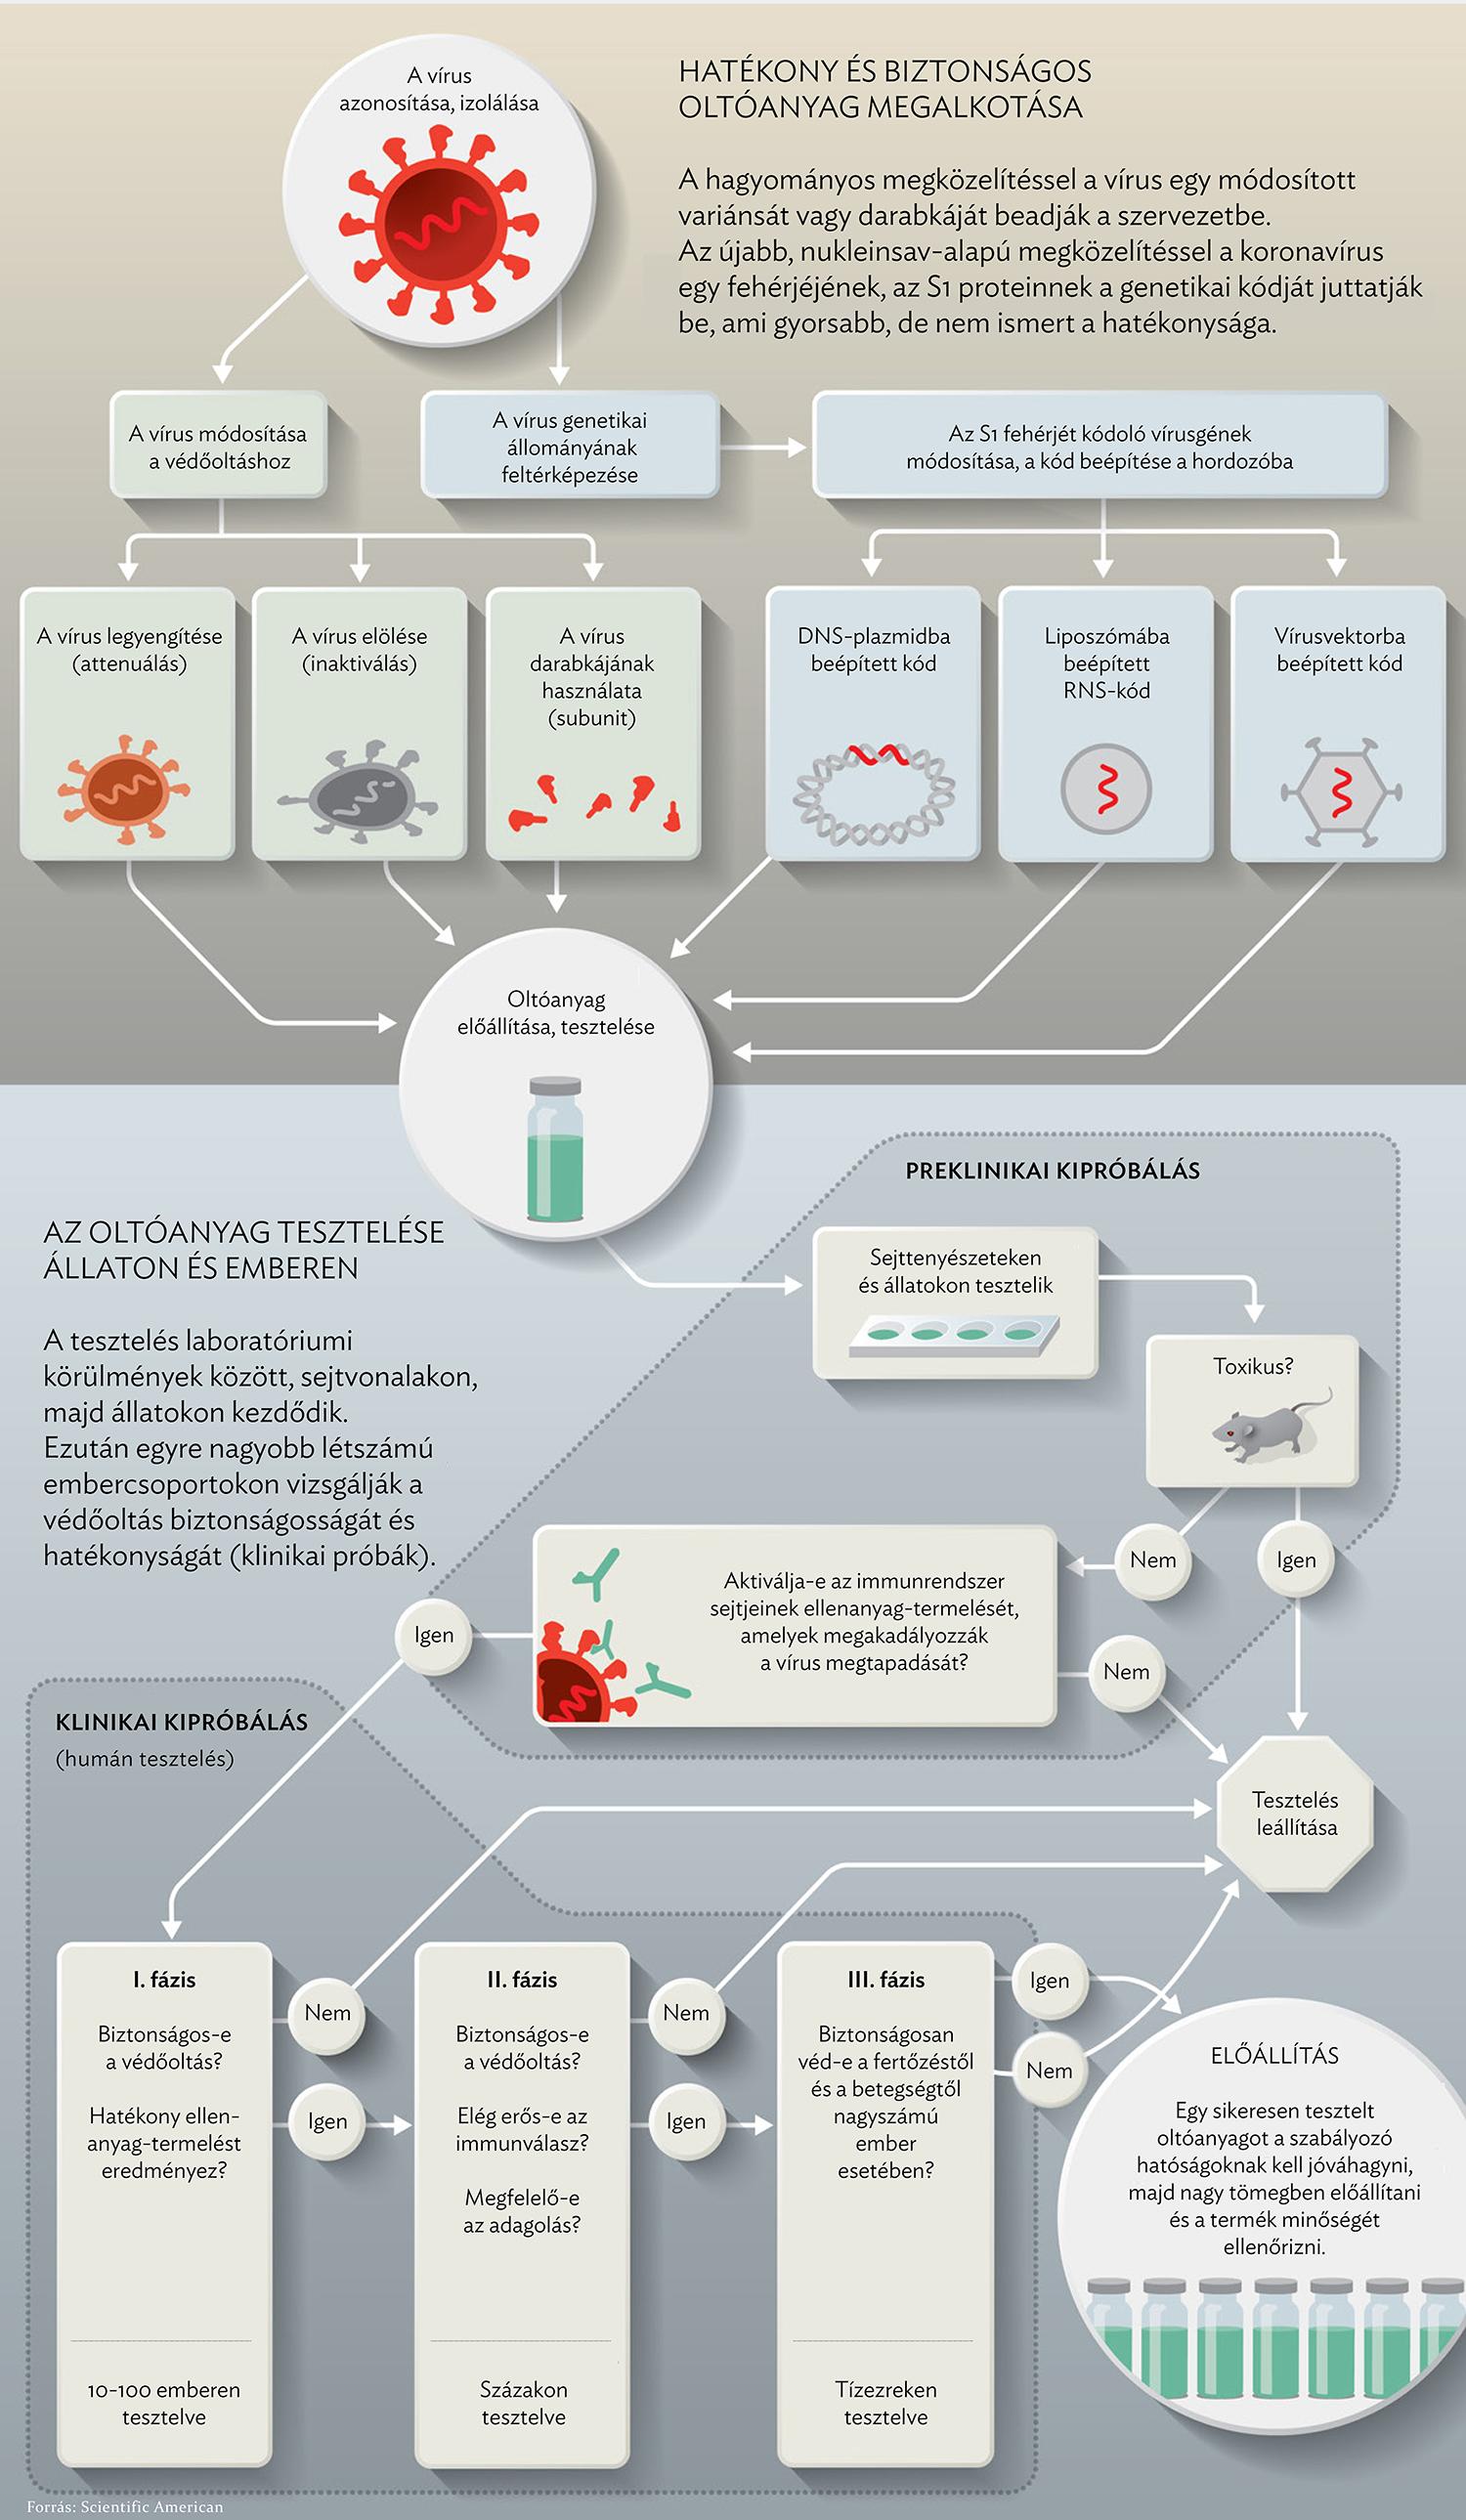 emberi papillomavírus elleni vakcina kínai nyelven enterobius vermicularis behandeling